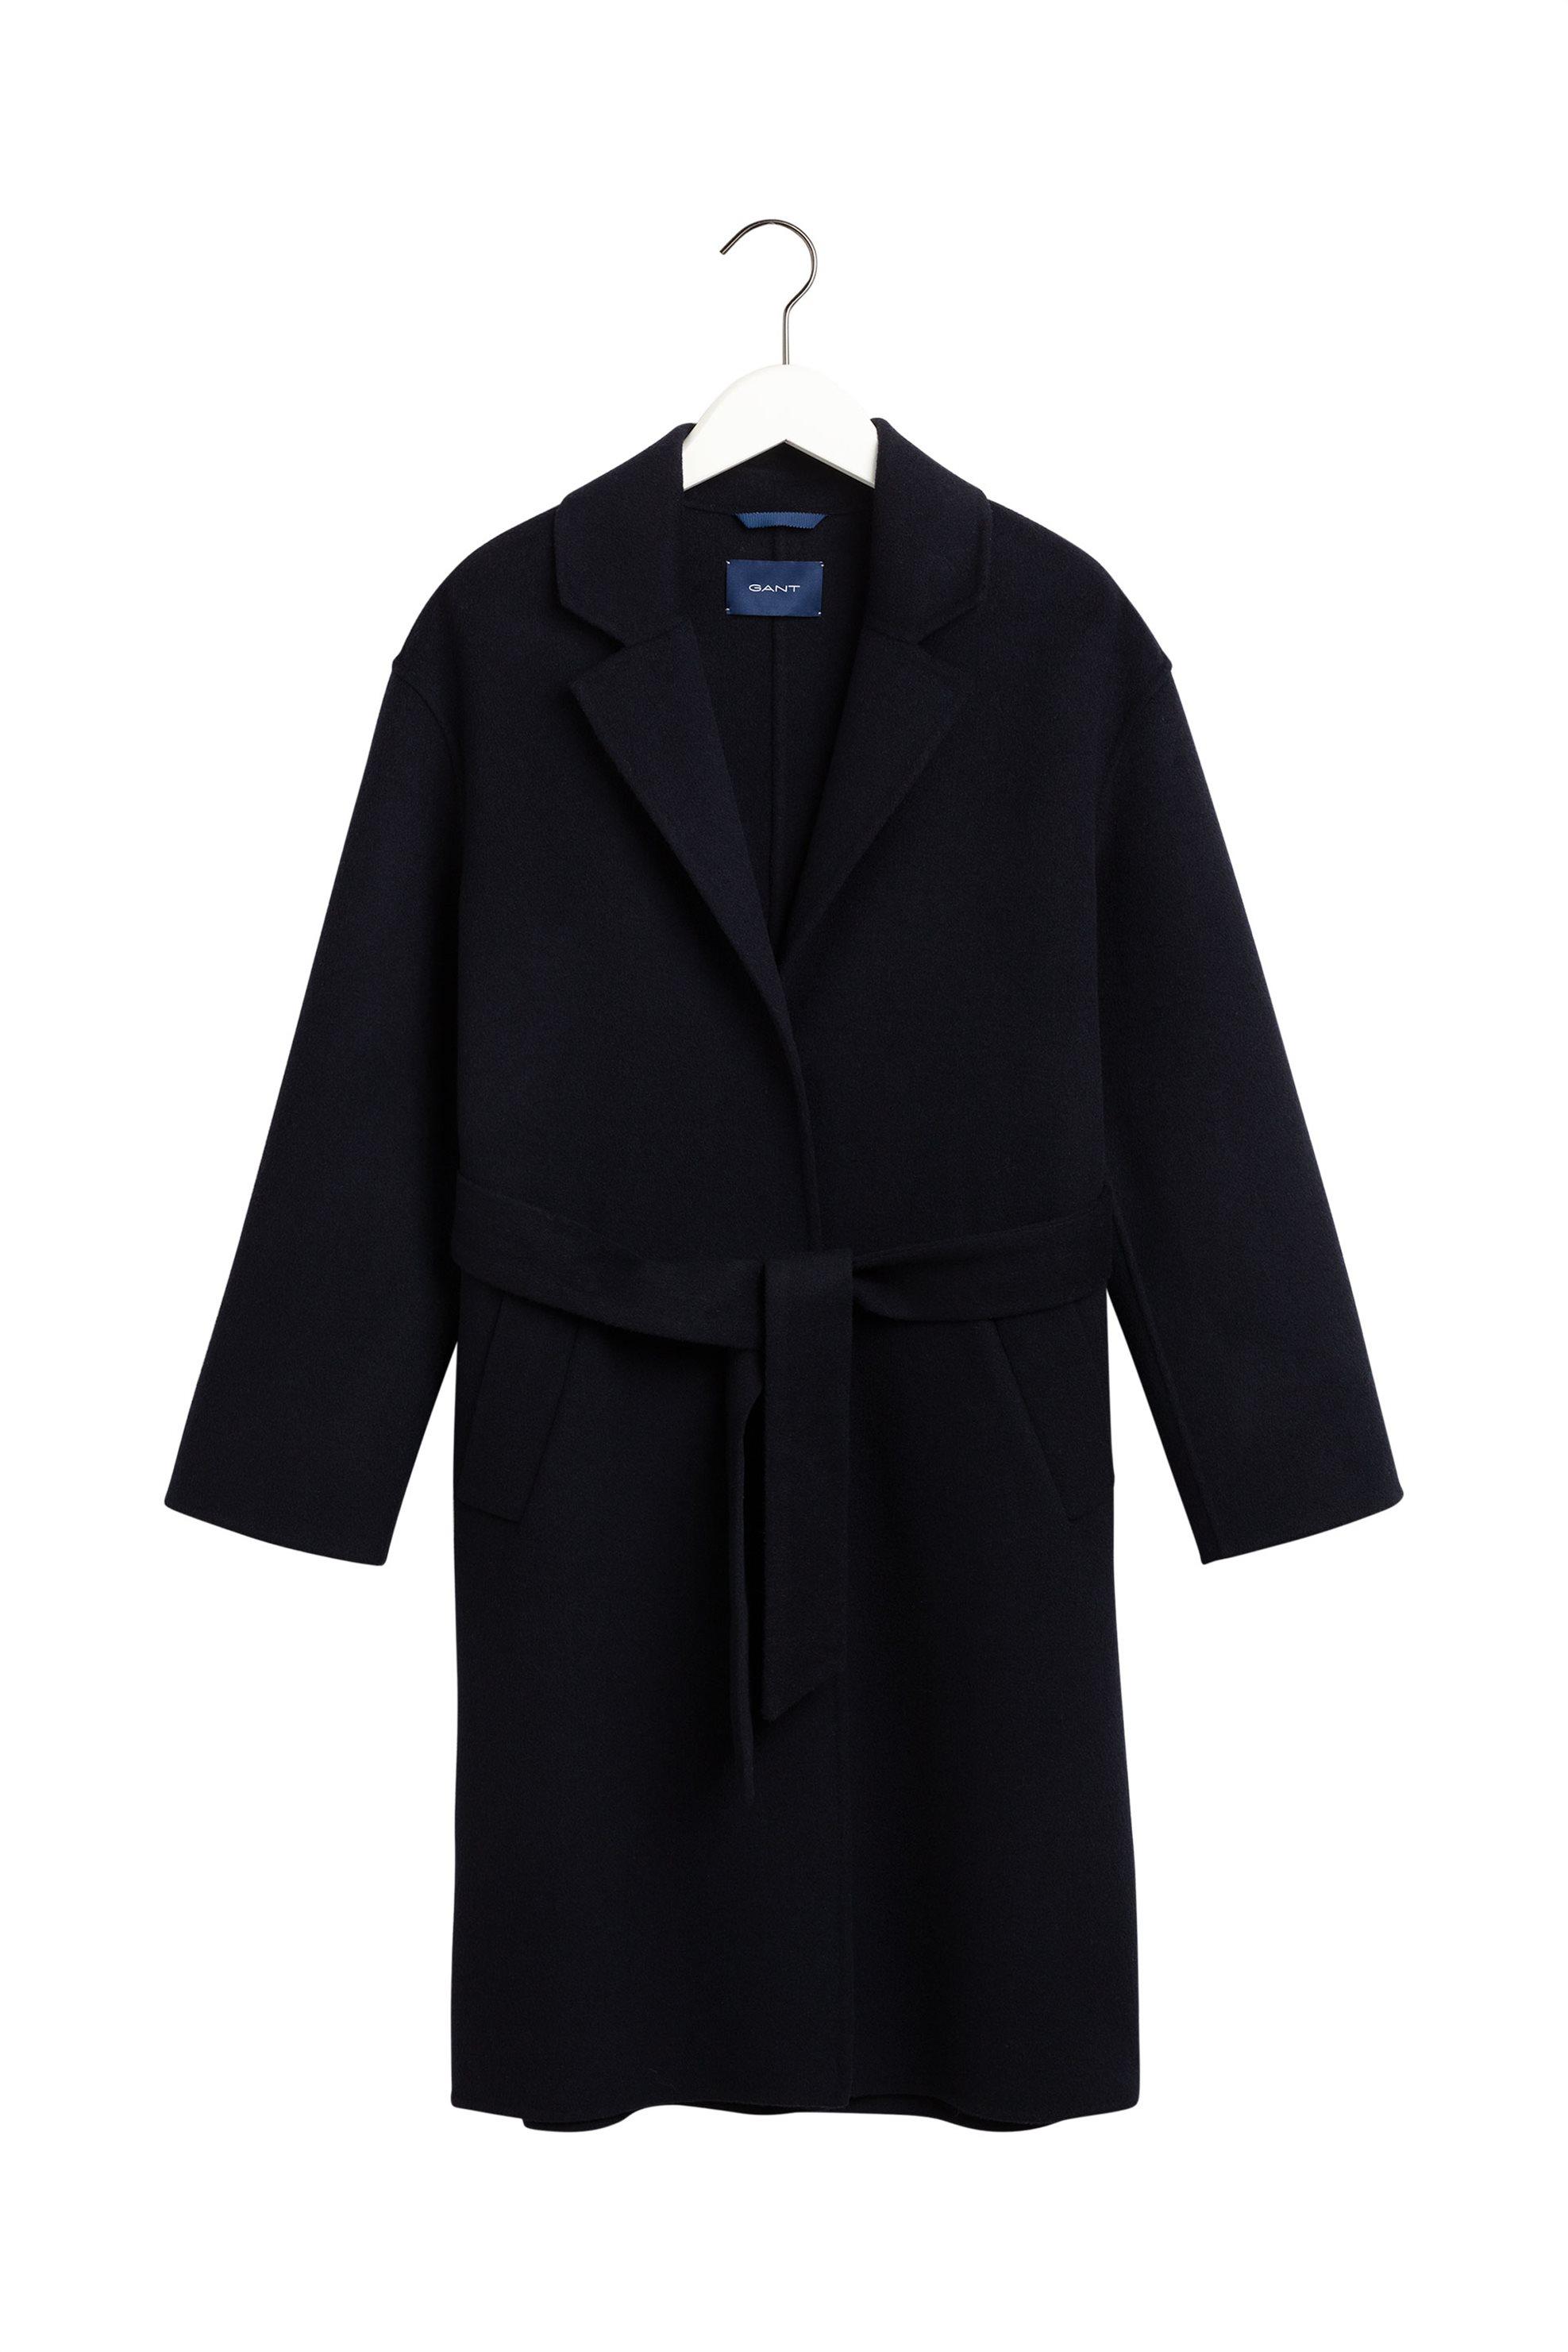 Gant γυναικείο midi κασμιρένιο παλτό με ζώνη - 4751025 - Μπλε Σκούρο